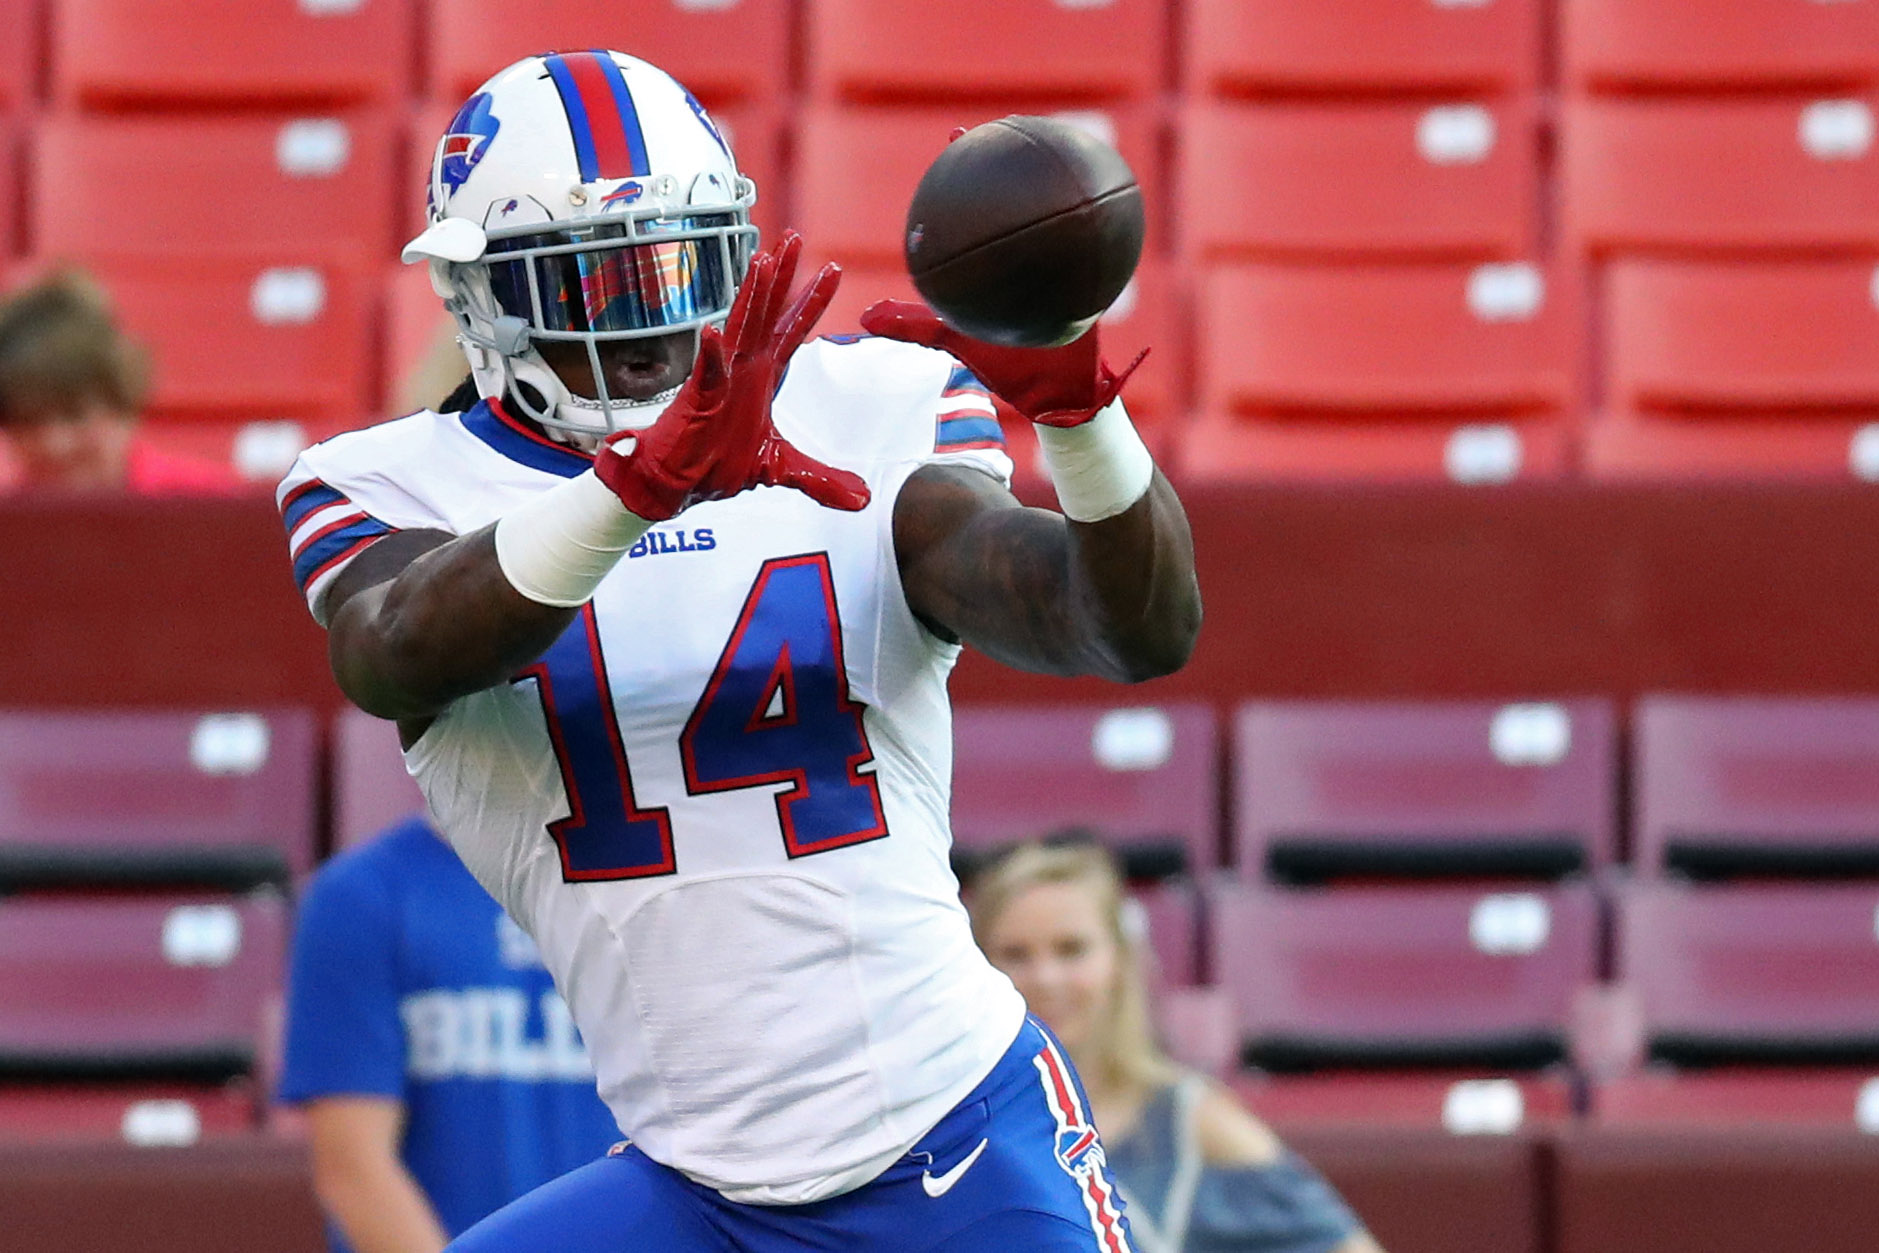 NFL: Preseason-Buffalo Bills at Washington Redskins